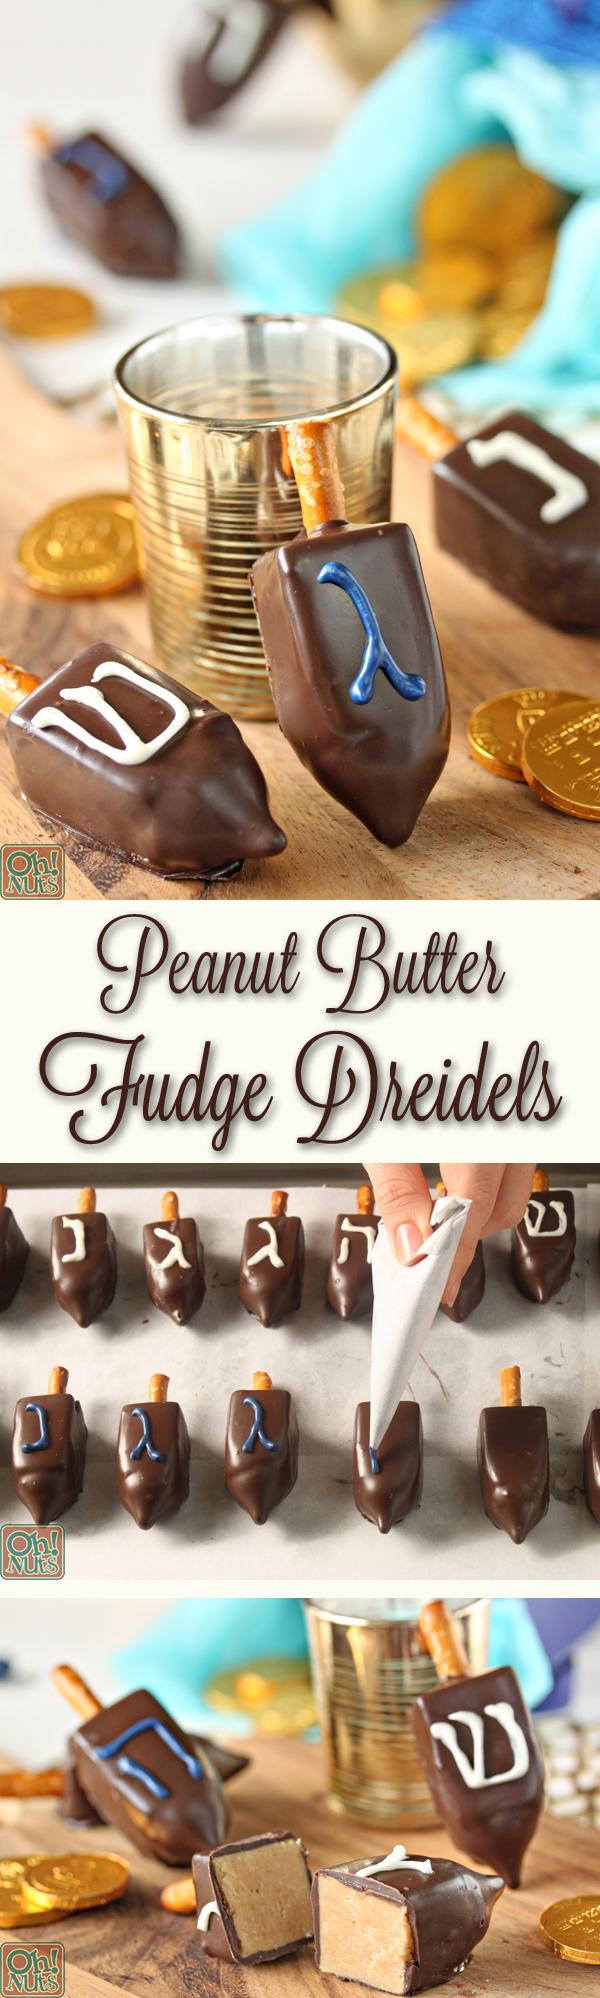 Peanut Butter Dreidels | From OhNuts.com